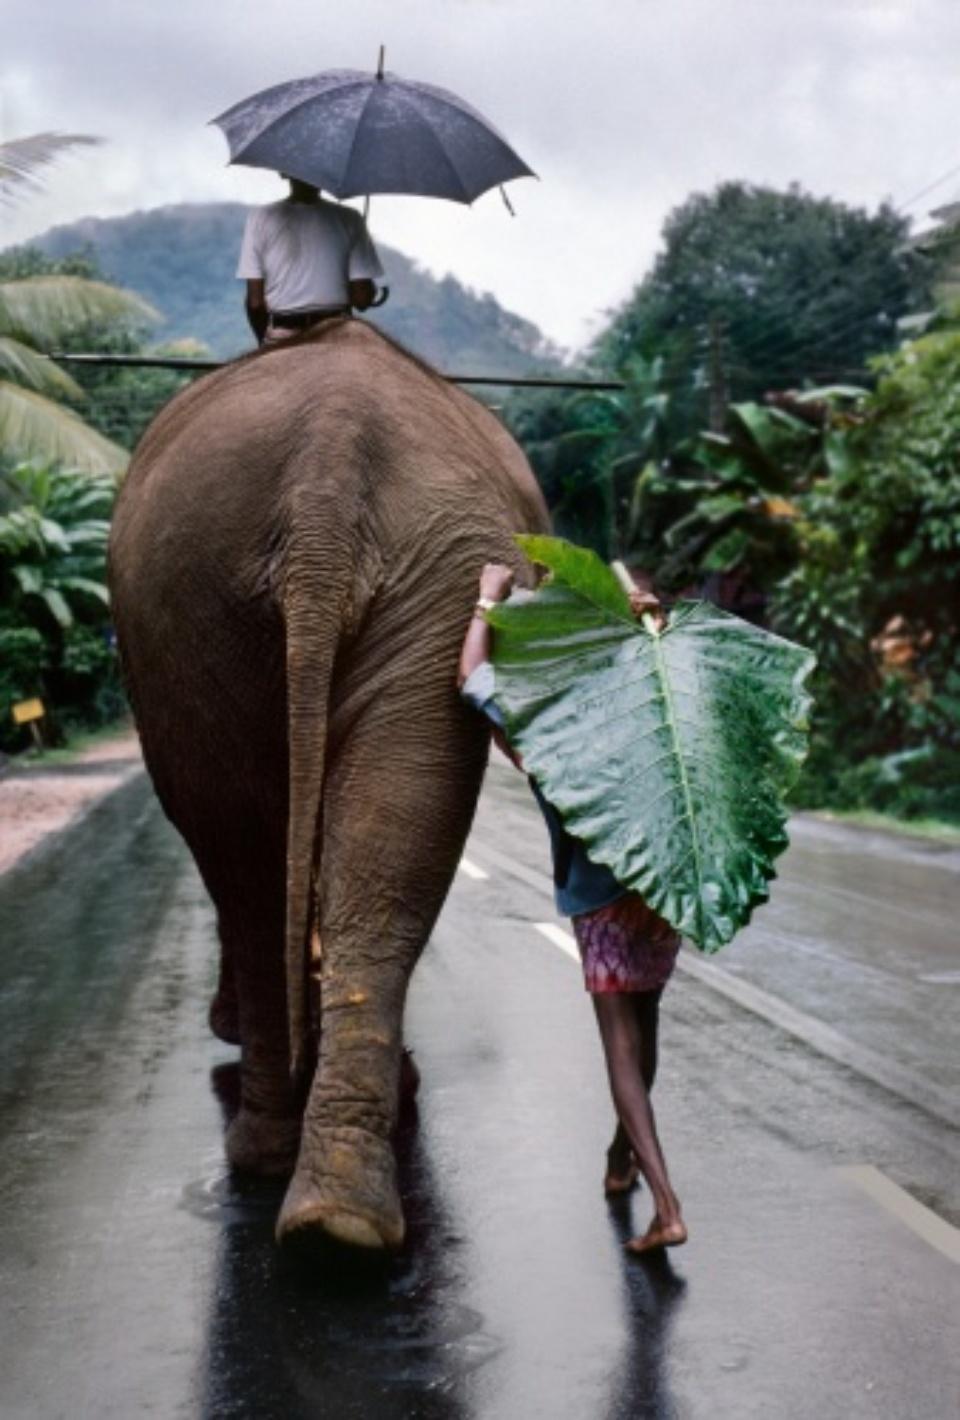 Young man walks behind Elephant Sri Lanka, 1995